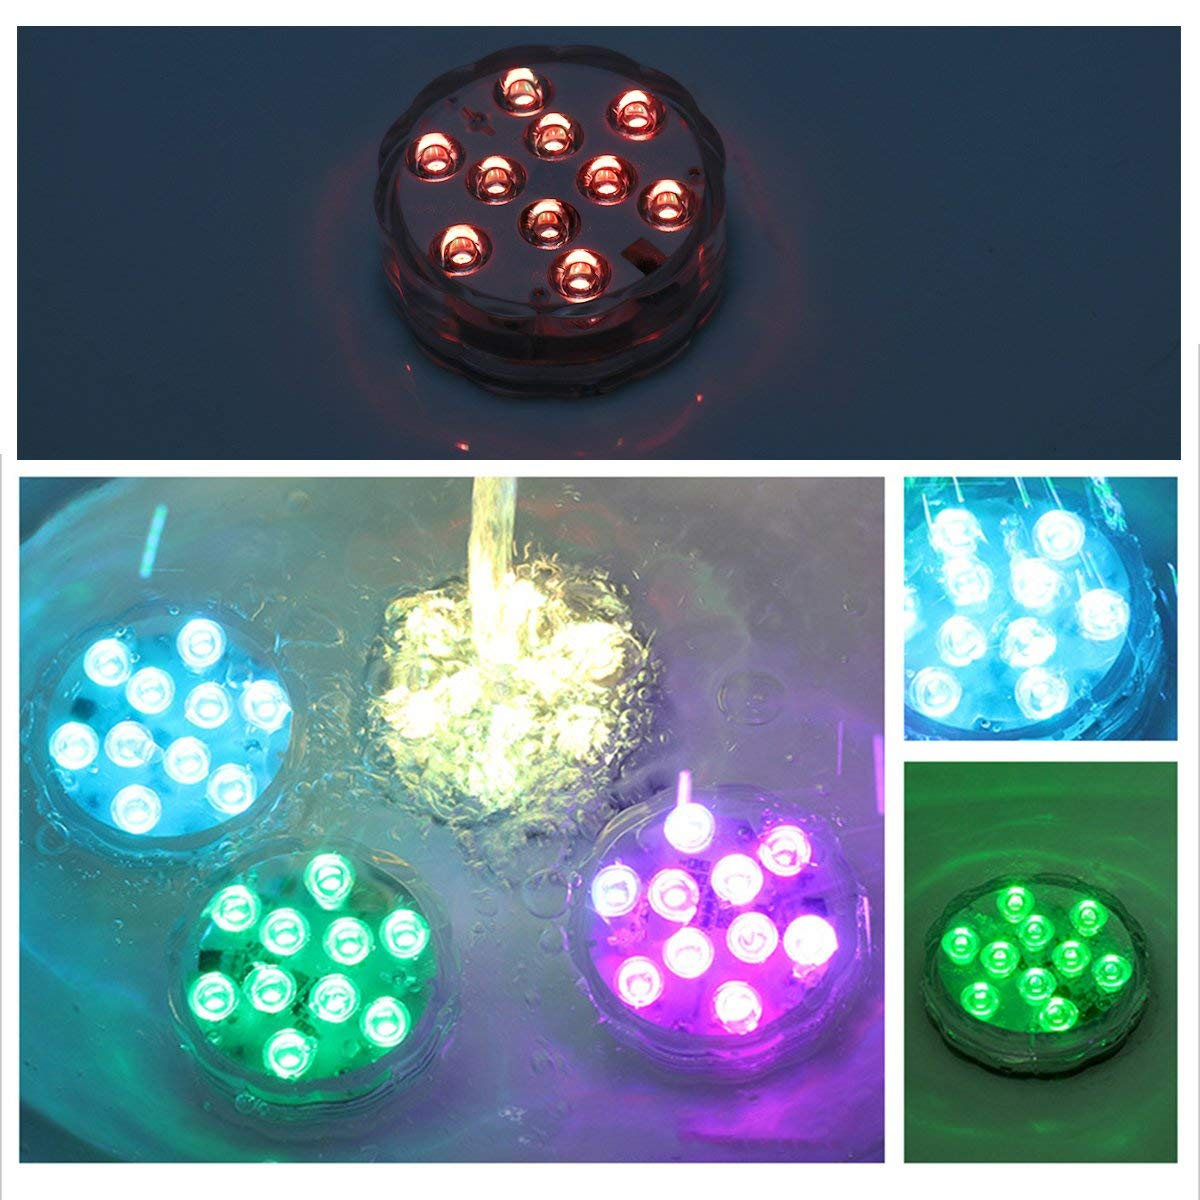 Remote RGB Color Changing Submersible LED Light Underwater Decor for Aquarium Fish Tanks Wedding Vase Garden Pond 2pcs